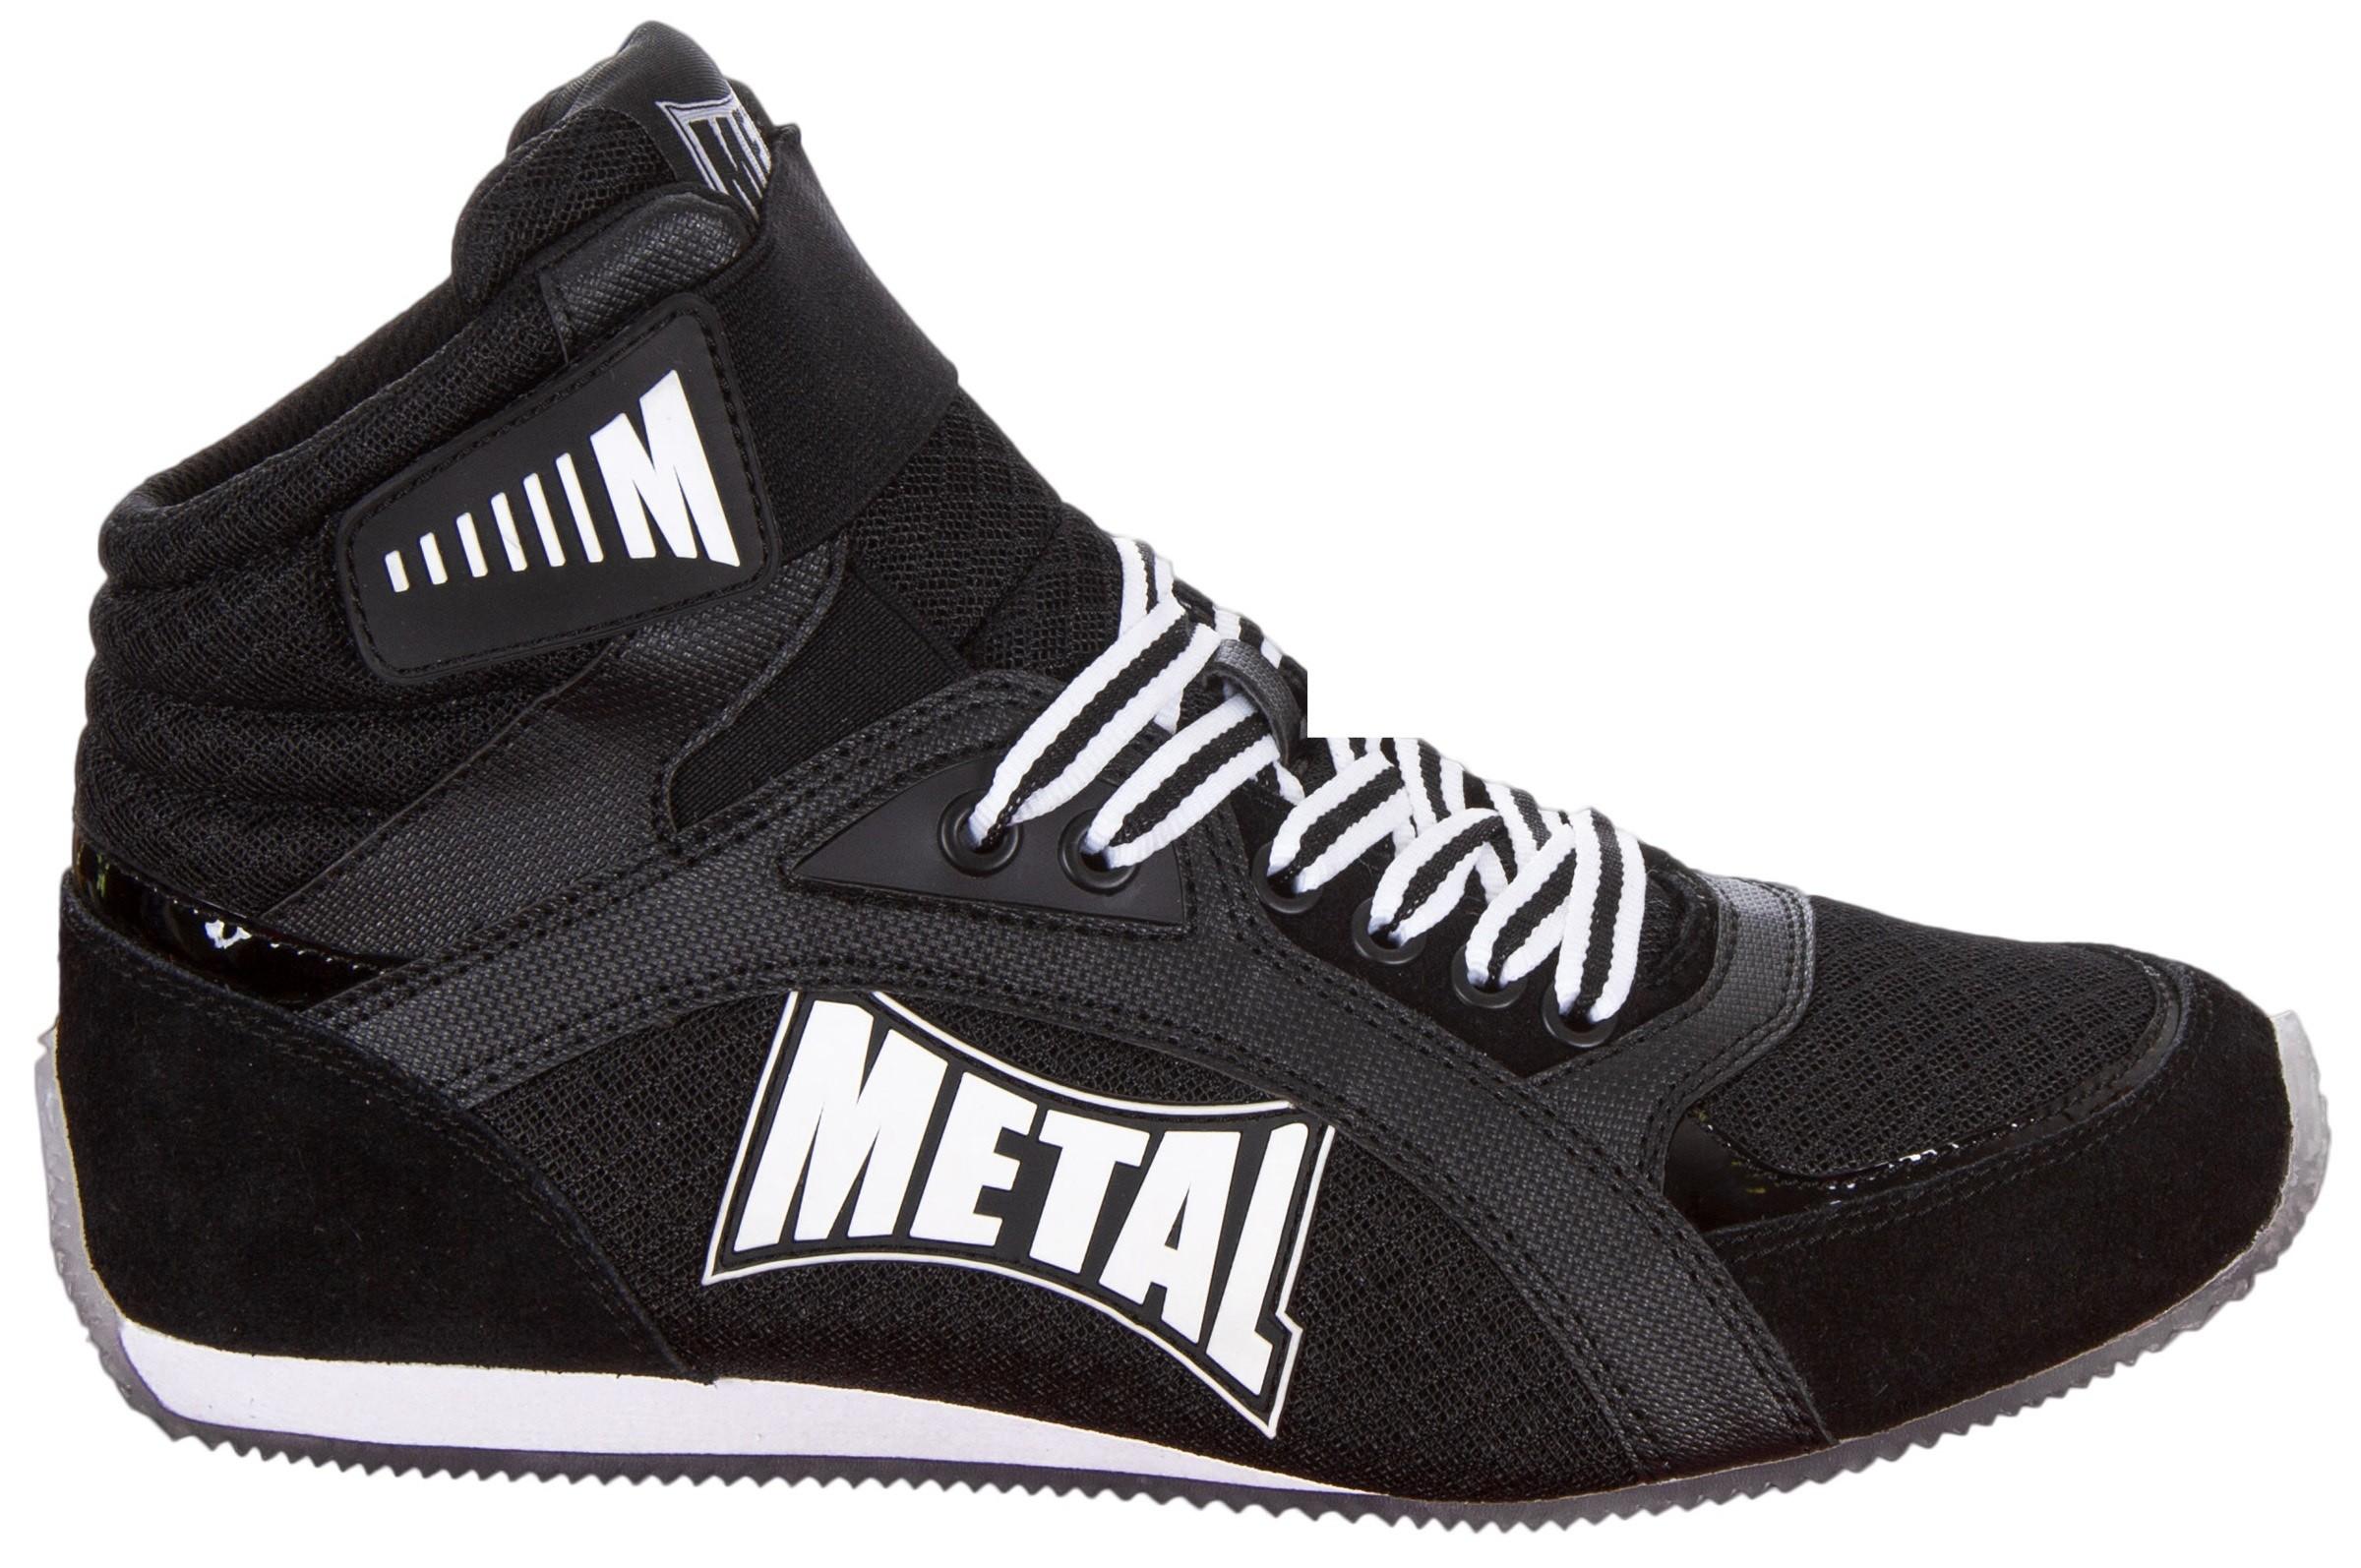 [Fin de série] Chaussures de Boxe, Viper 1 CH100N, Metal Boxe DragonSports.eu